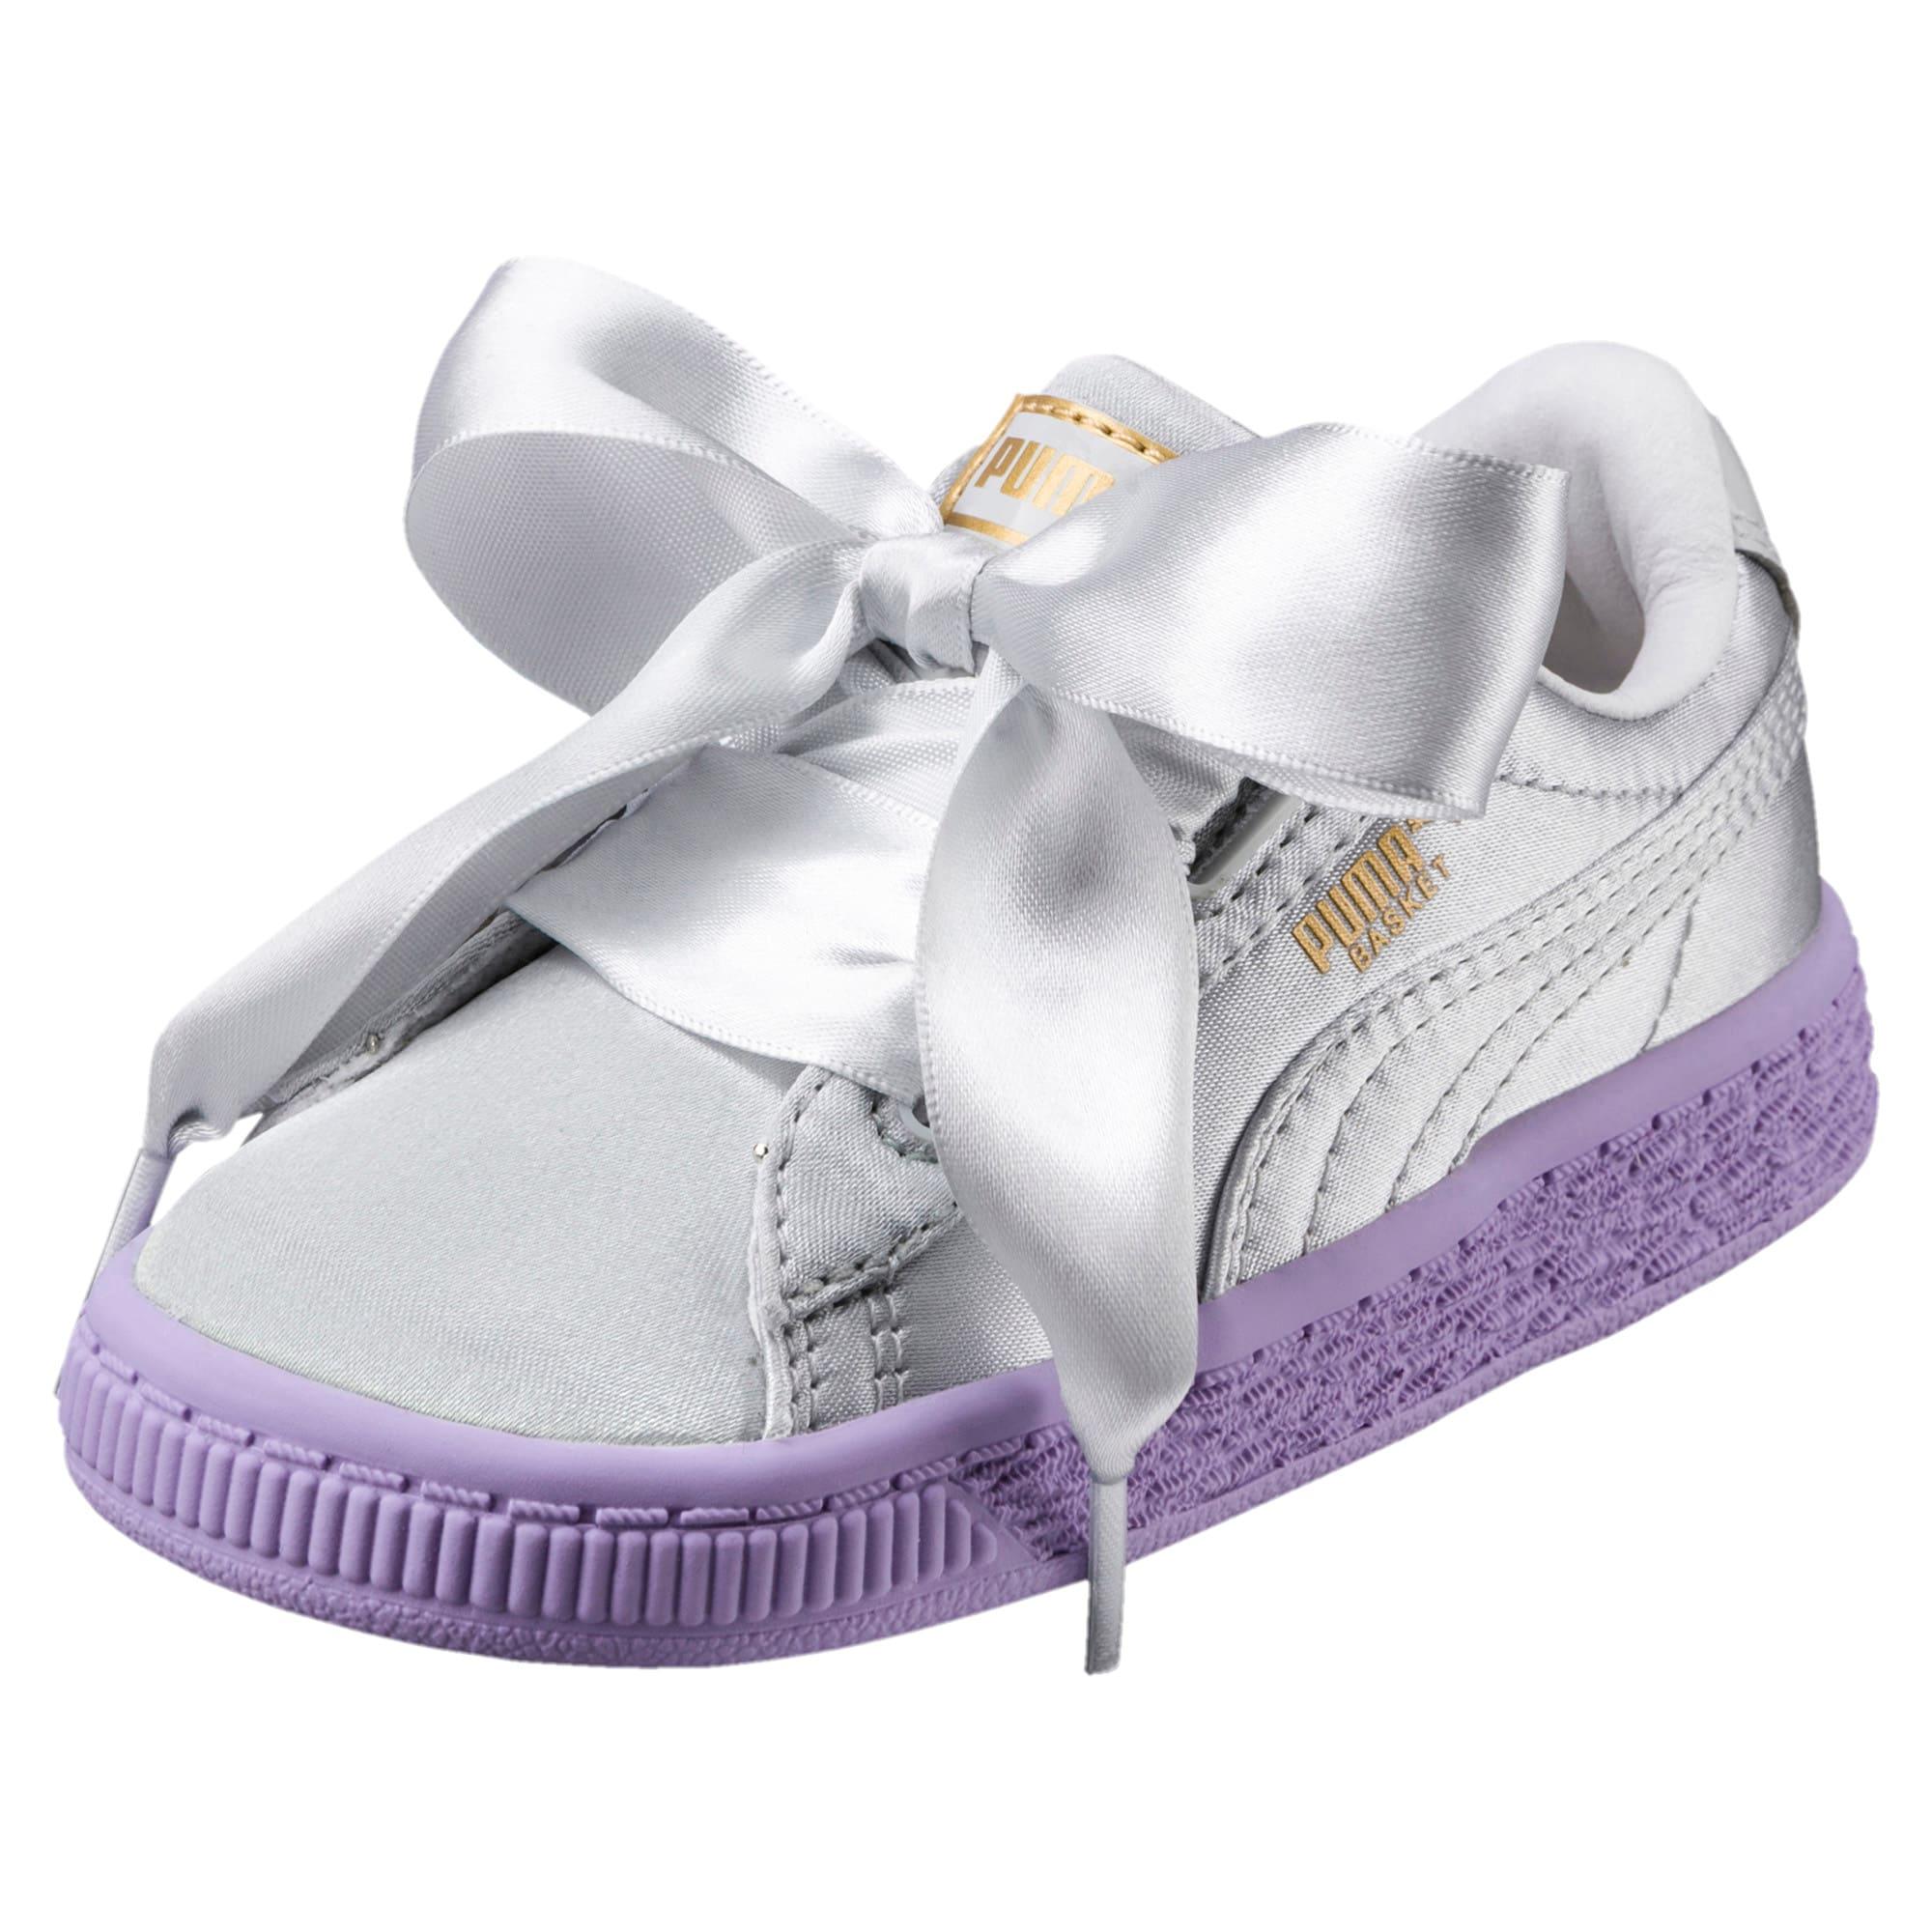 Thumbnail 1 of Basket Heart Toddler Shoes, Glacier Gray-Glacier Gray, medium